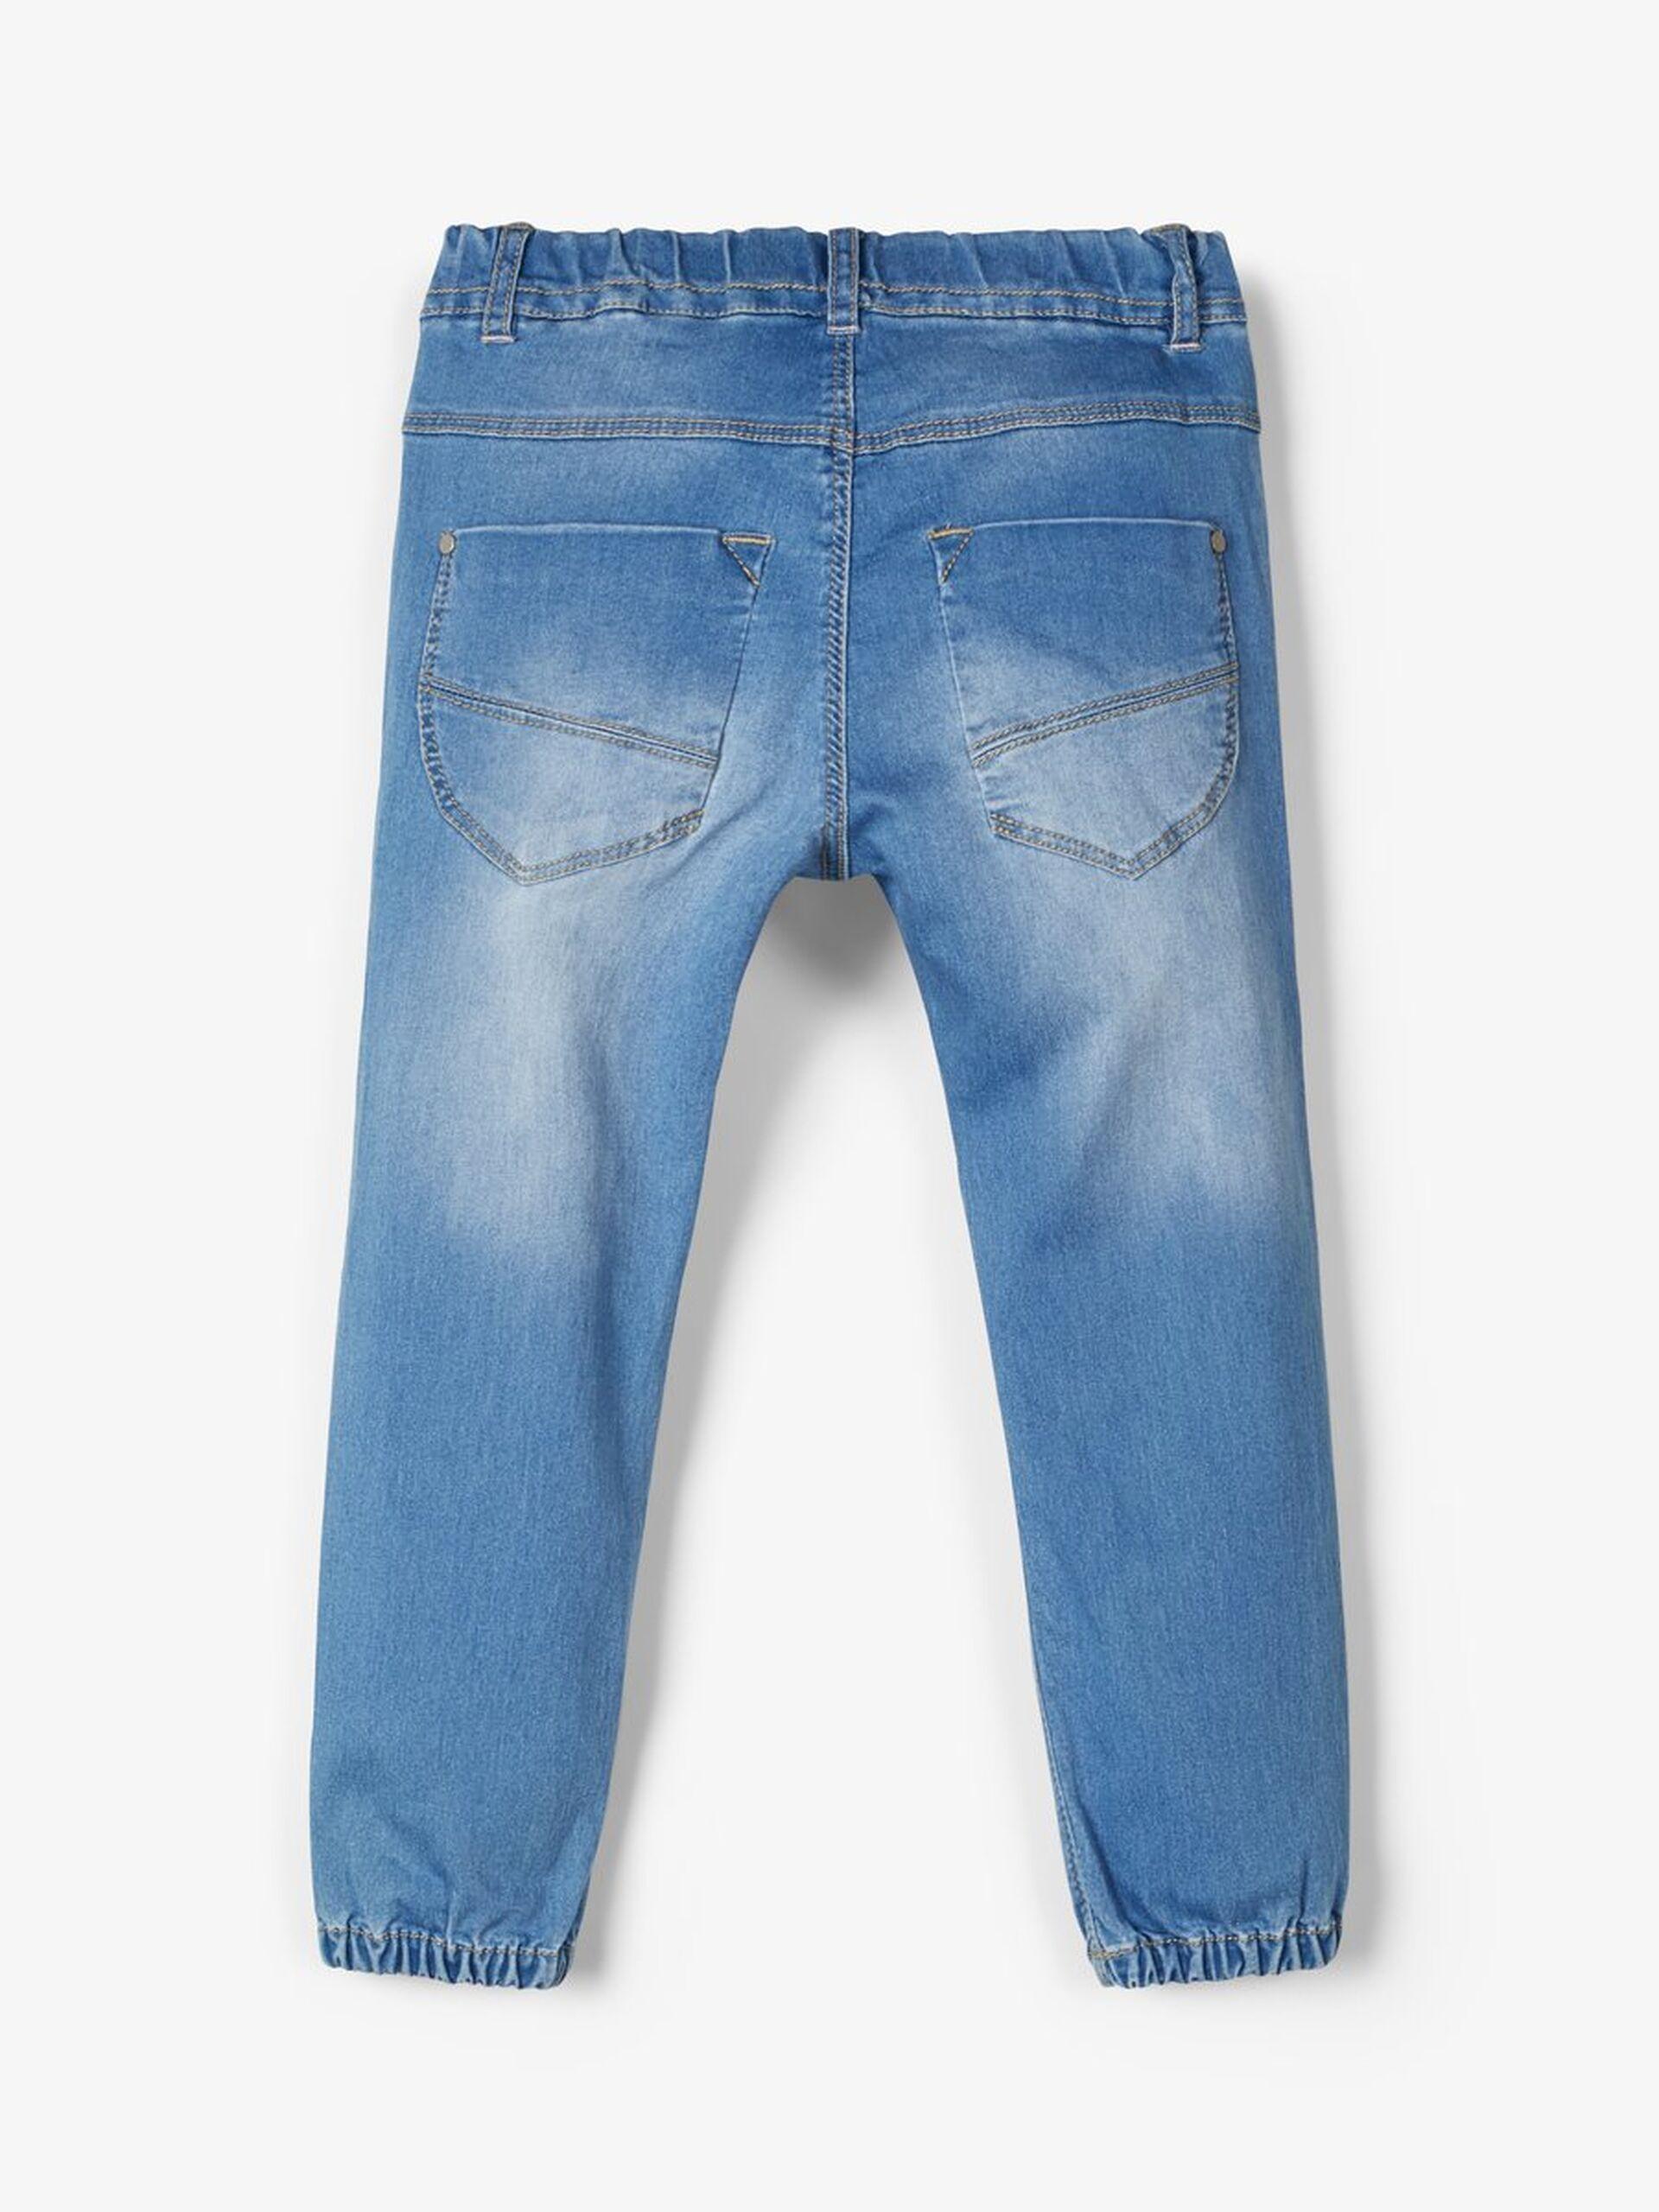 NmfBibi dnmtolly 2322 bukse, medium blue denim